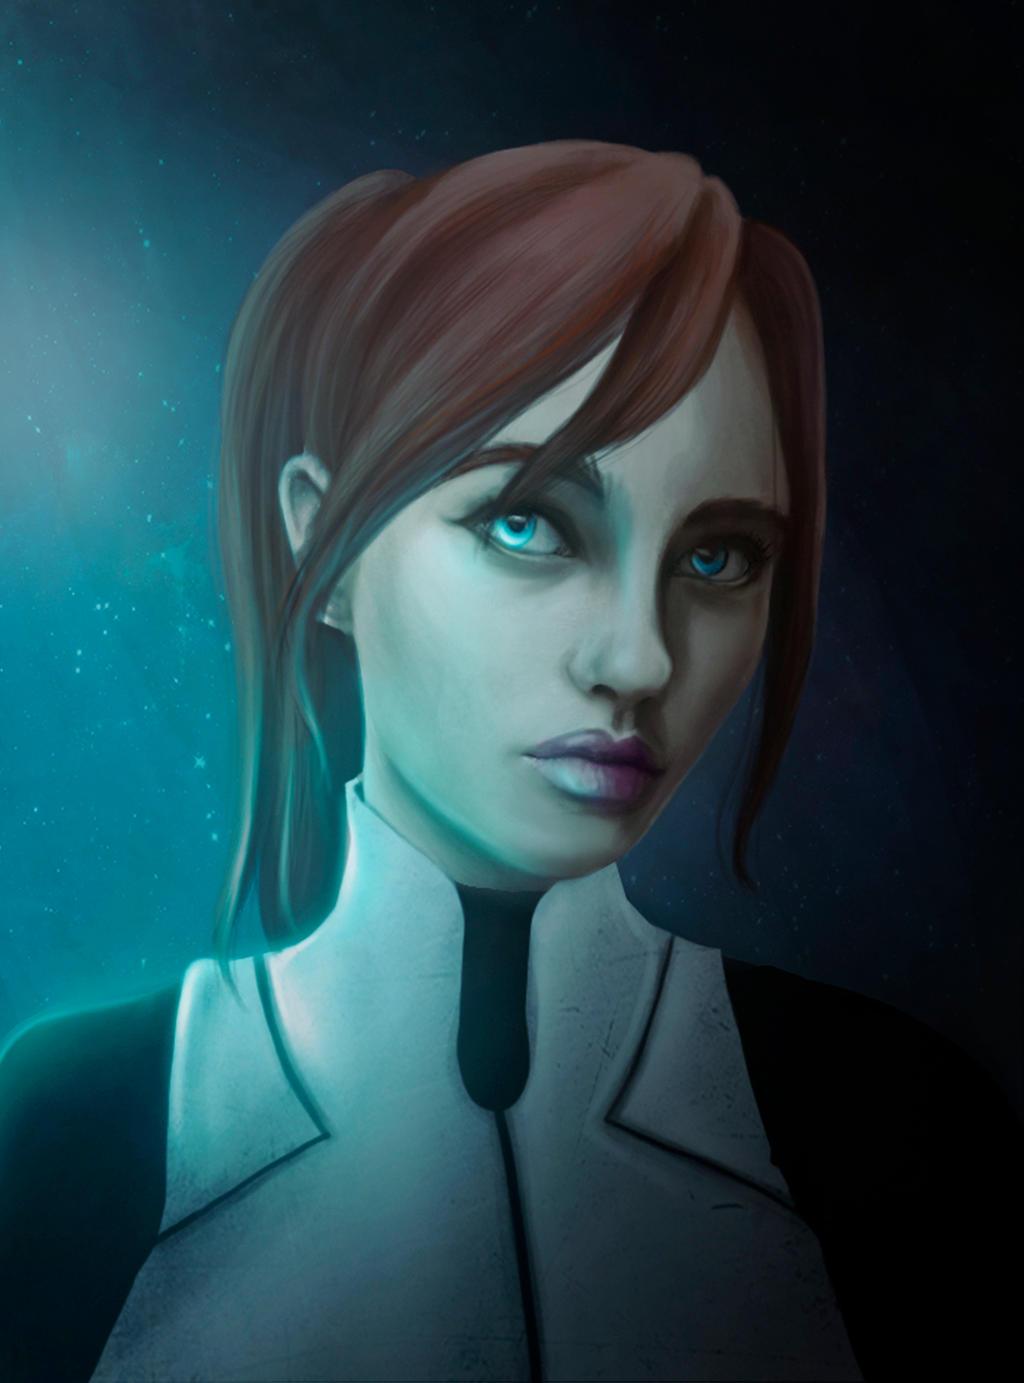 Sara Ryder - Mass Effect Andromeda Fanart (MEA) by Luh-Dwolf